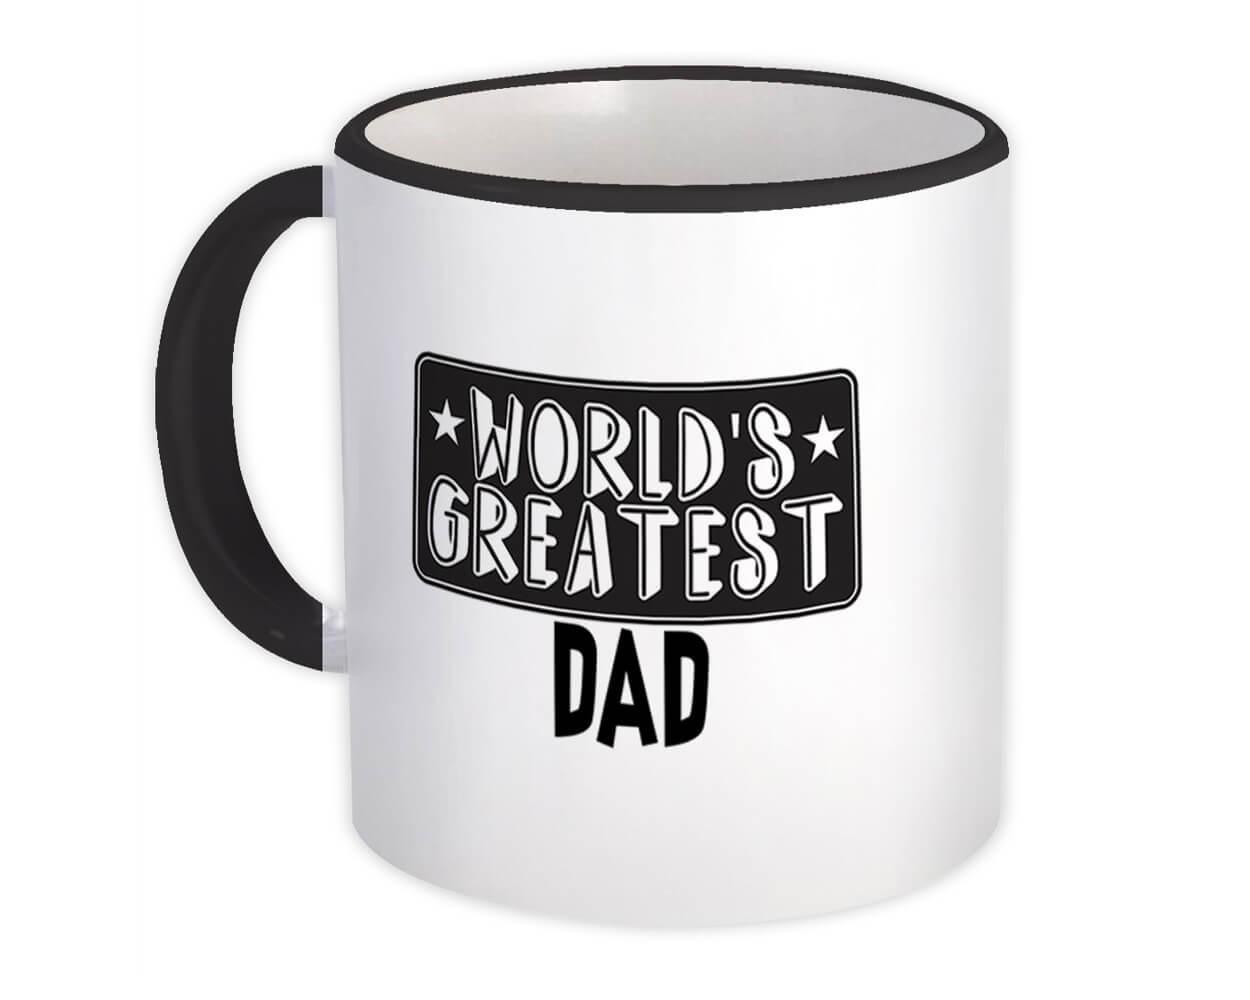 World Greatest DAD : Gift Mug Family Christmas Birthday Father